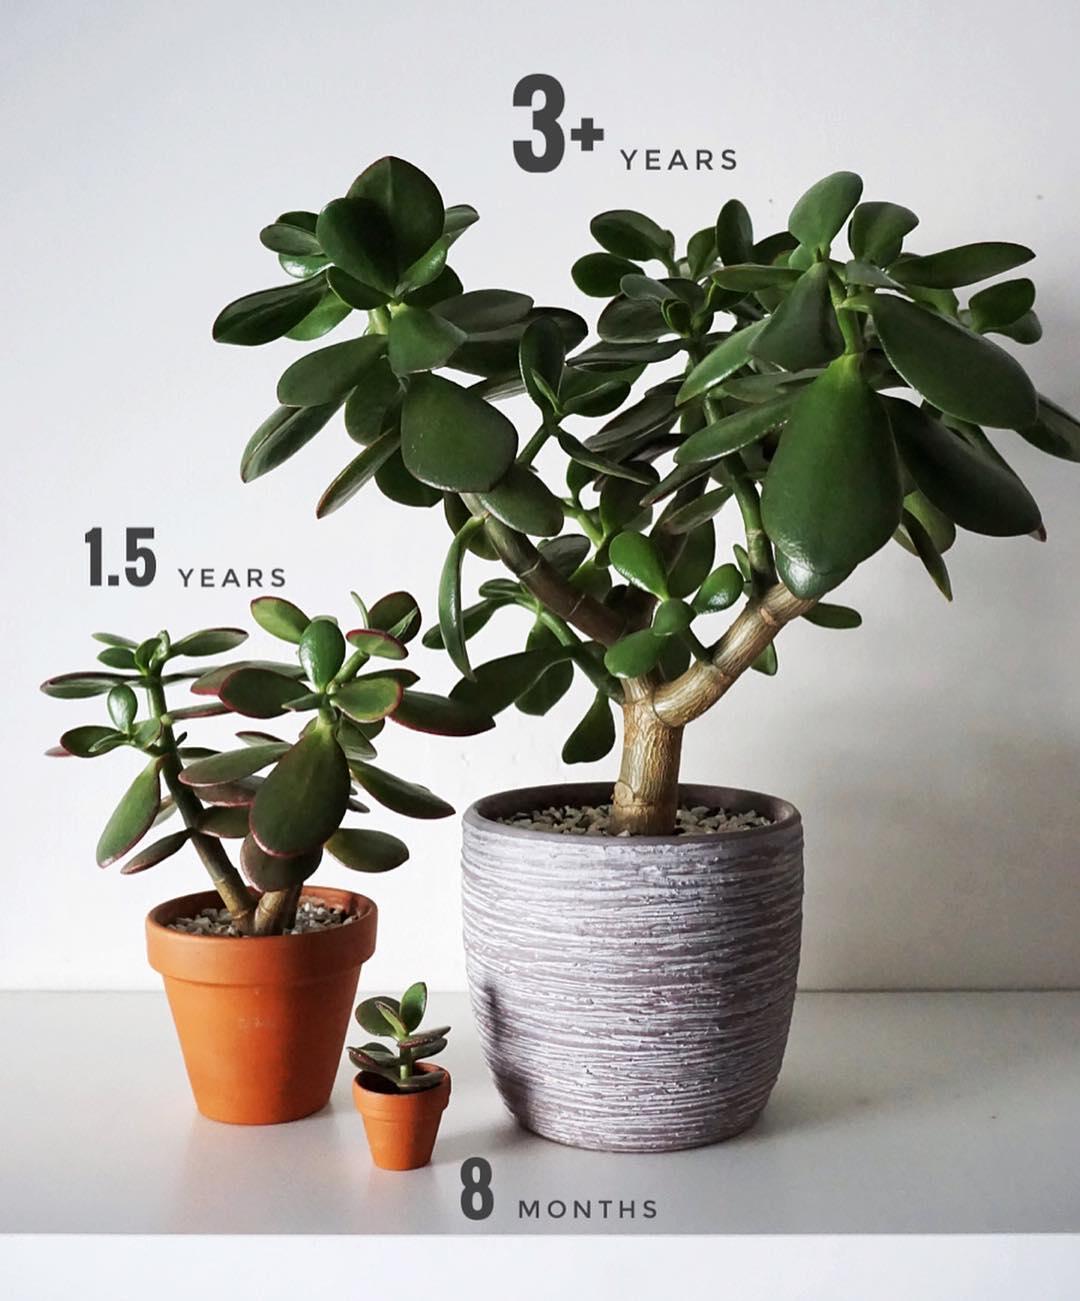 Crassula Ovata the Jade Plant